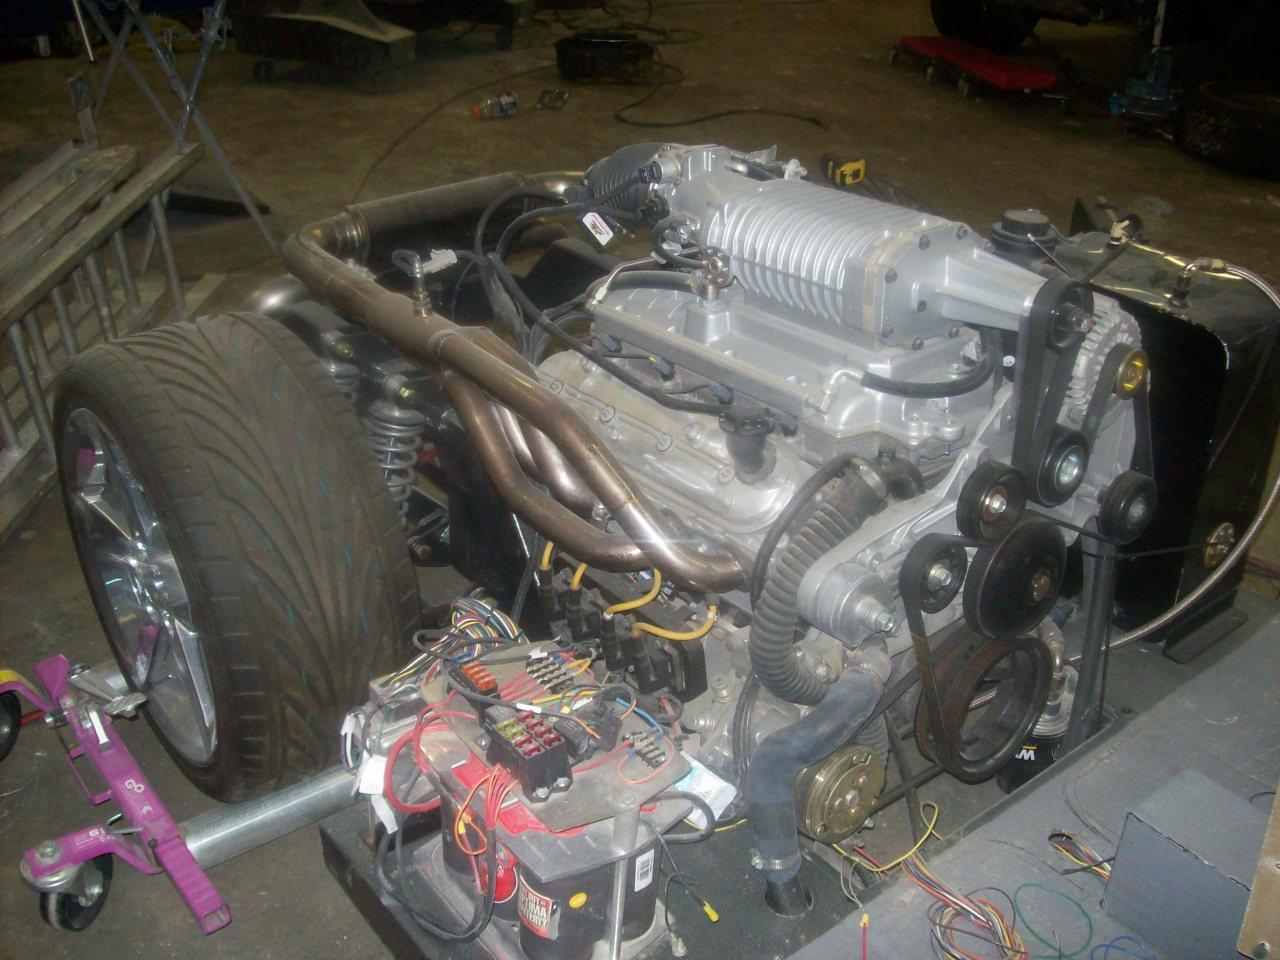 TheSamba com :: Gallery - Supergharged V8 mid engine Ghia